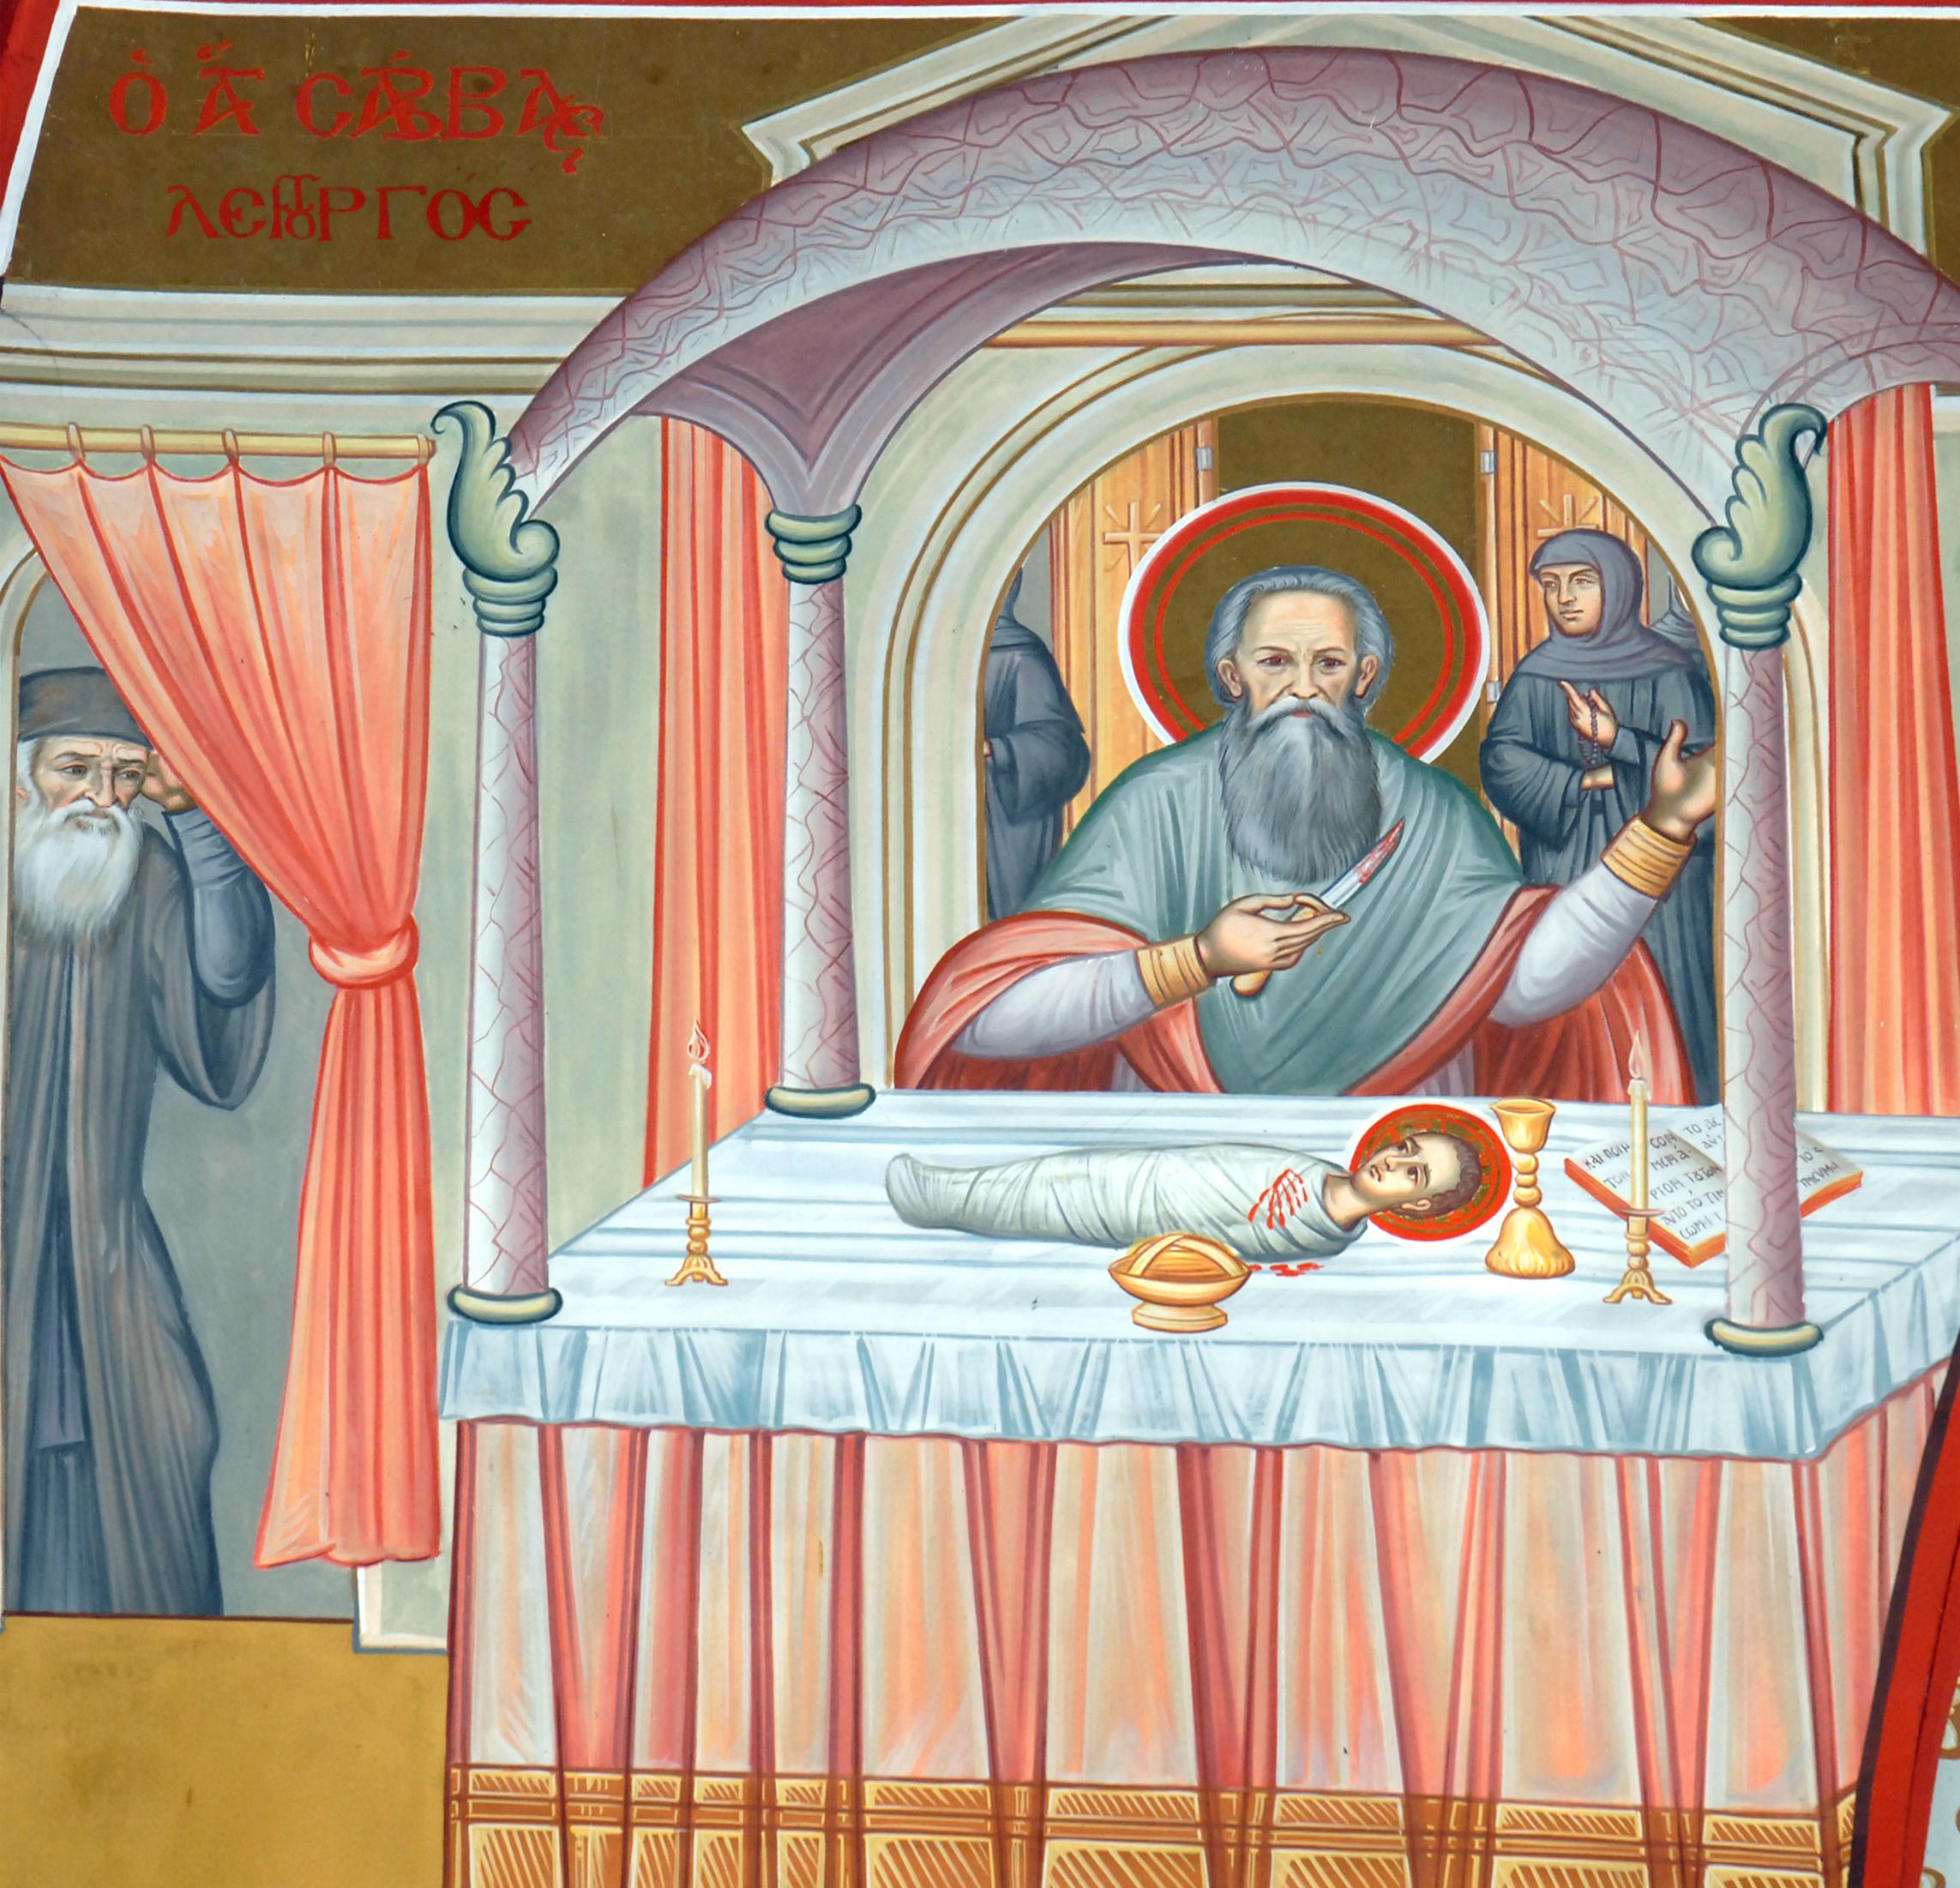 St Savvas of Kalymnos liturgising